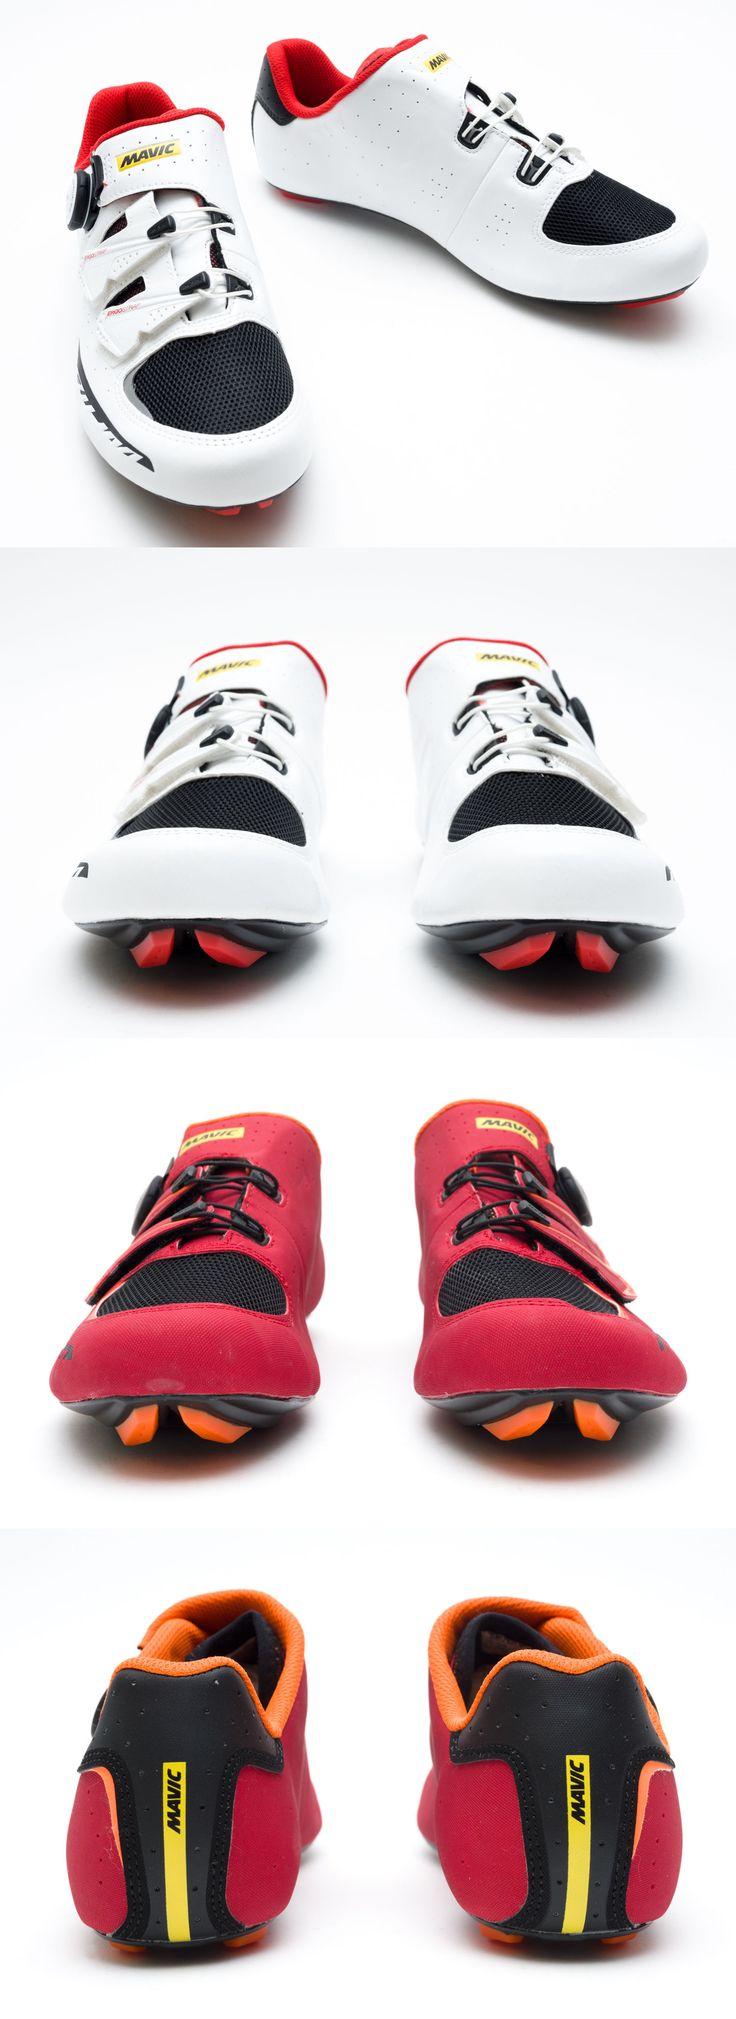 Men 158986: Mavic Ksyrium Pro Ii Men Carbon Road Bike Shoes 3 Bolt Cleat Eu 42 2 3 Us 9 New -> BUY IT NOW ONLY: $74.95 on eBay!